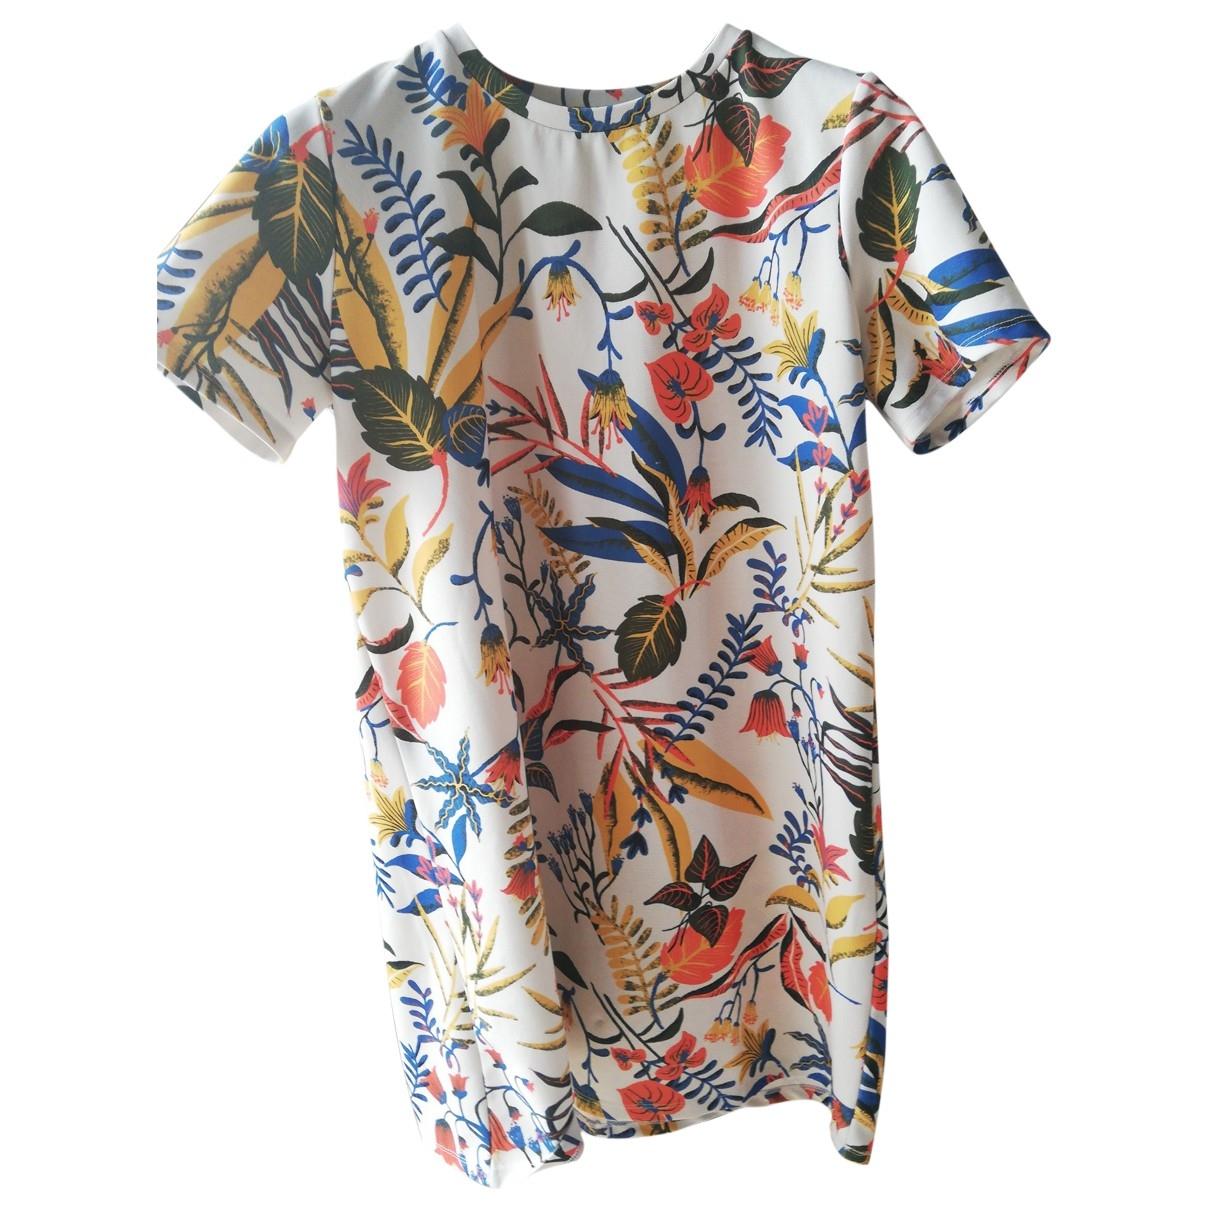 Zara \N Multicolour dress for Women L International